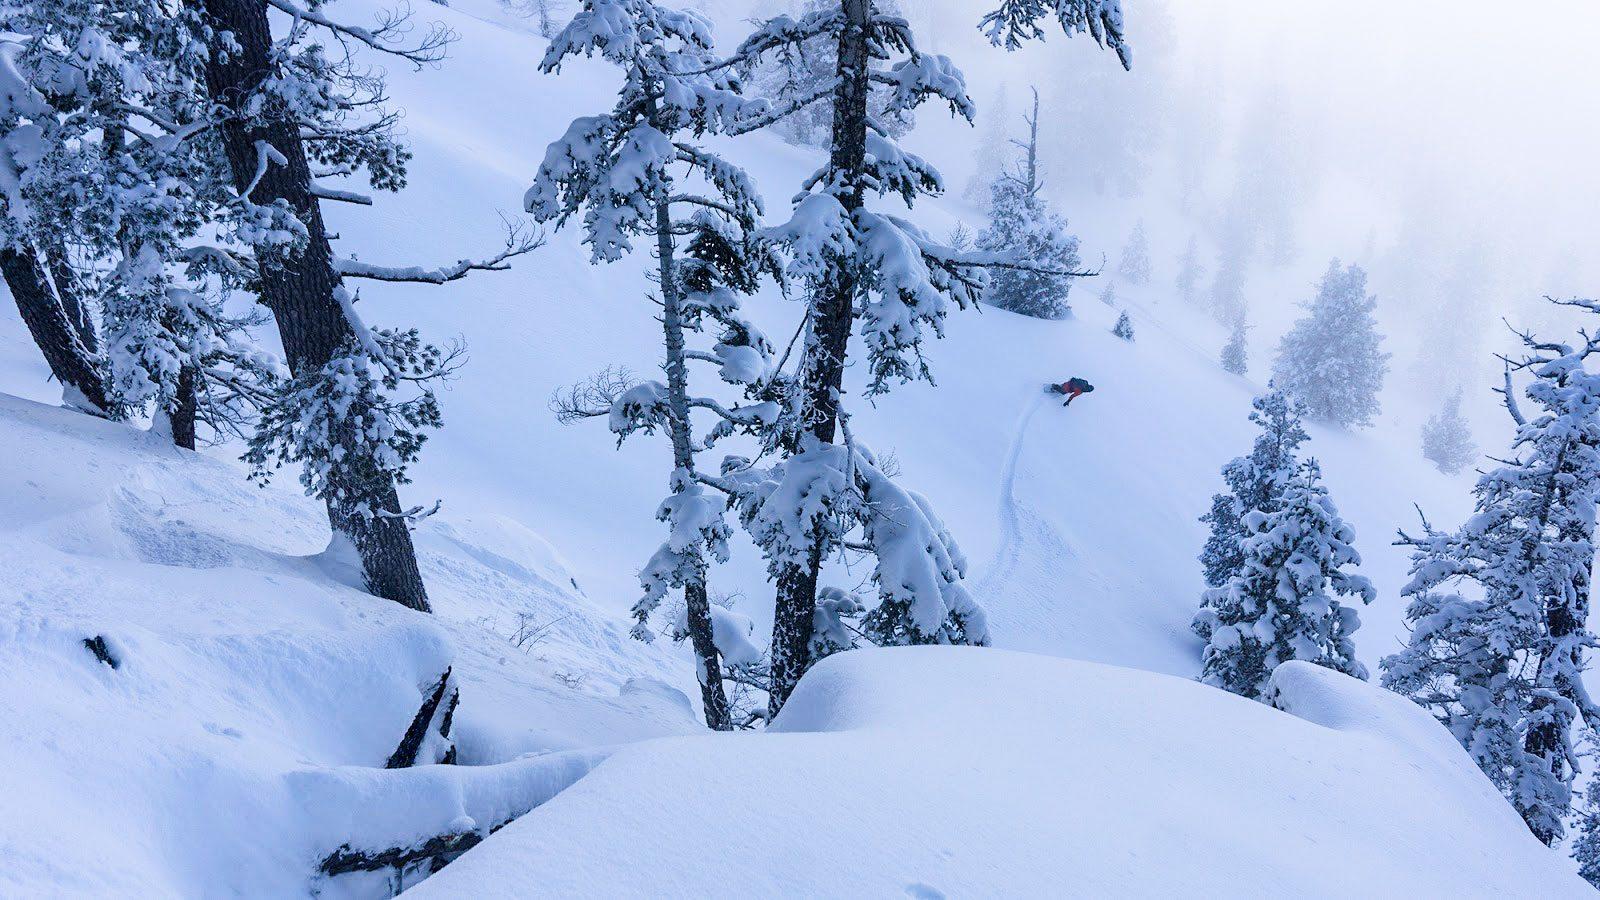 snowboarder in low light